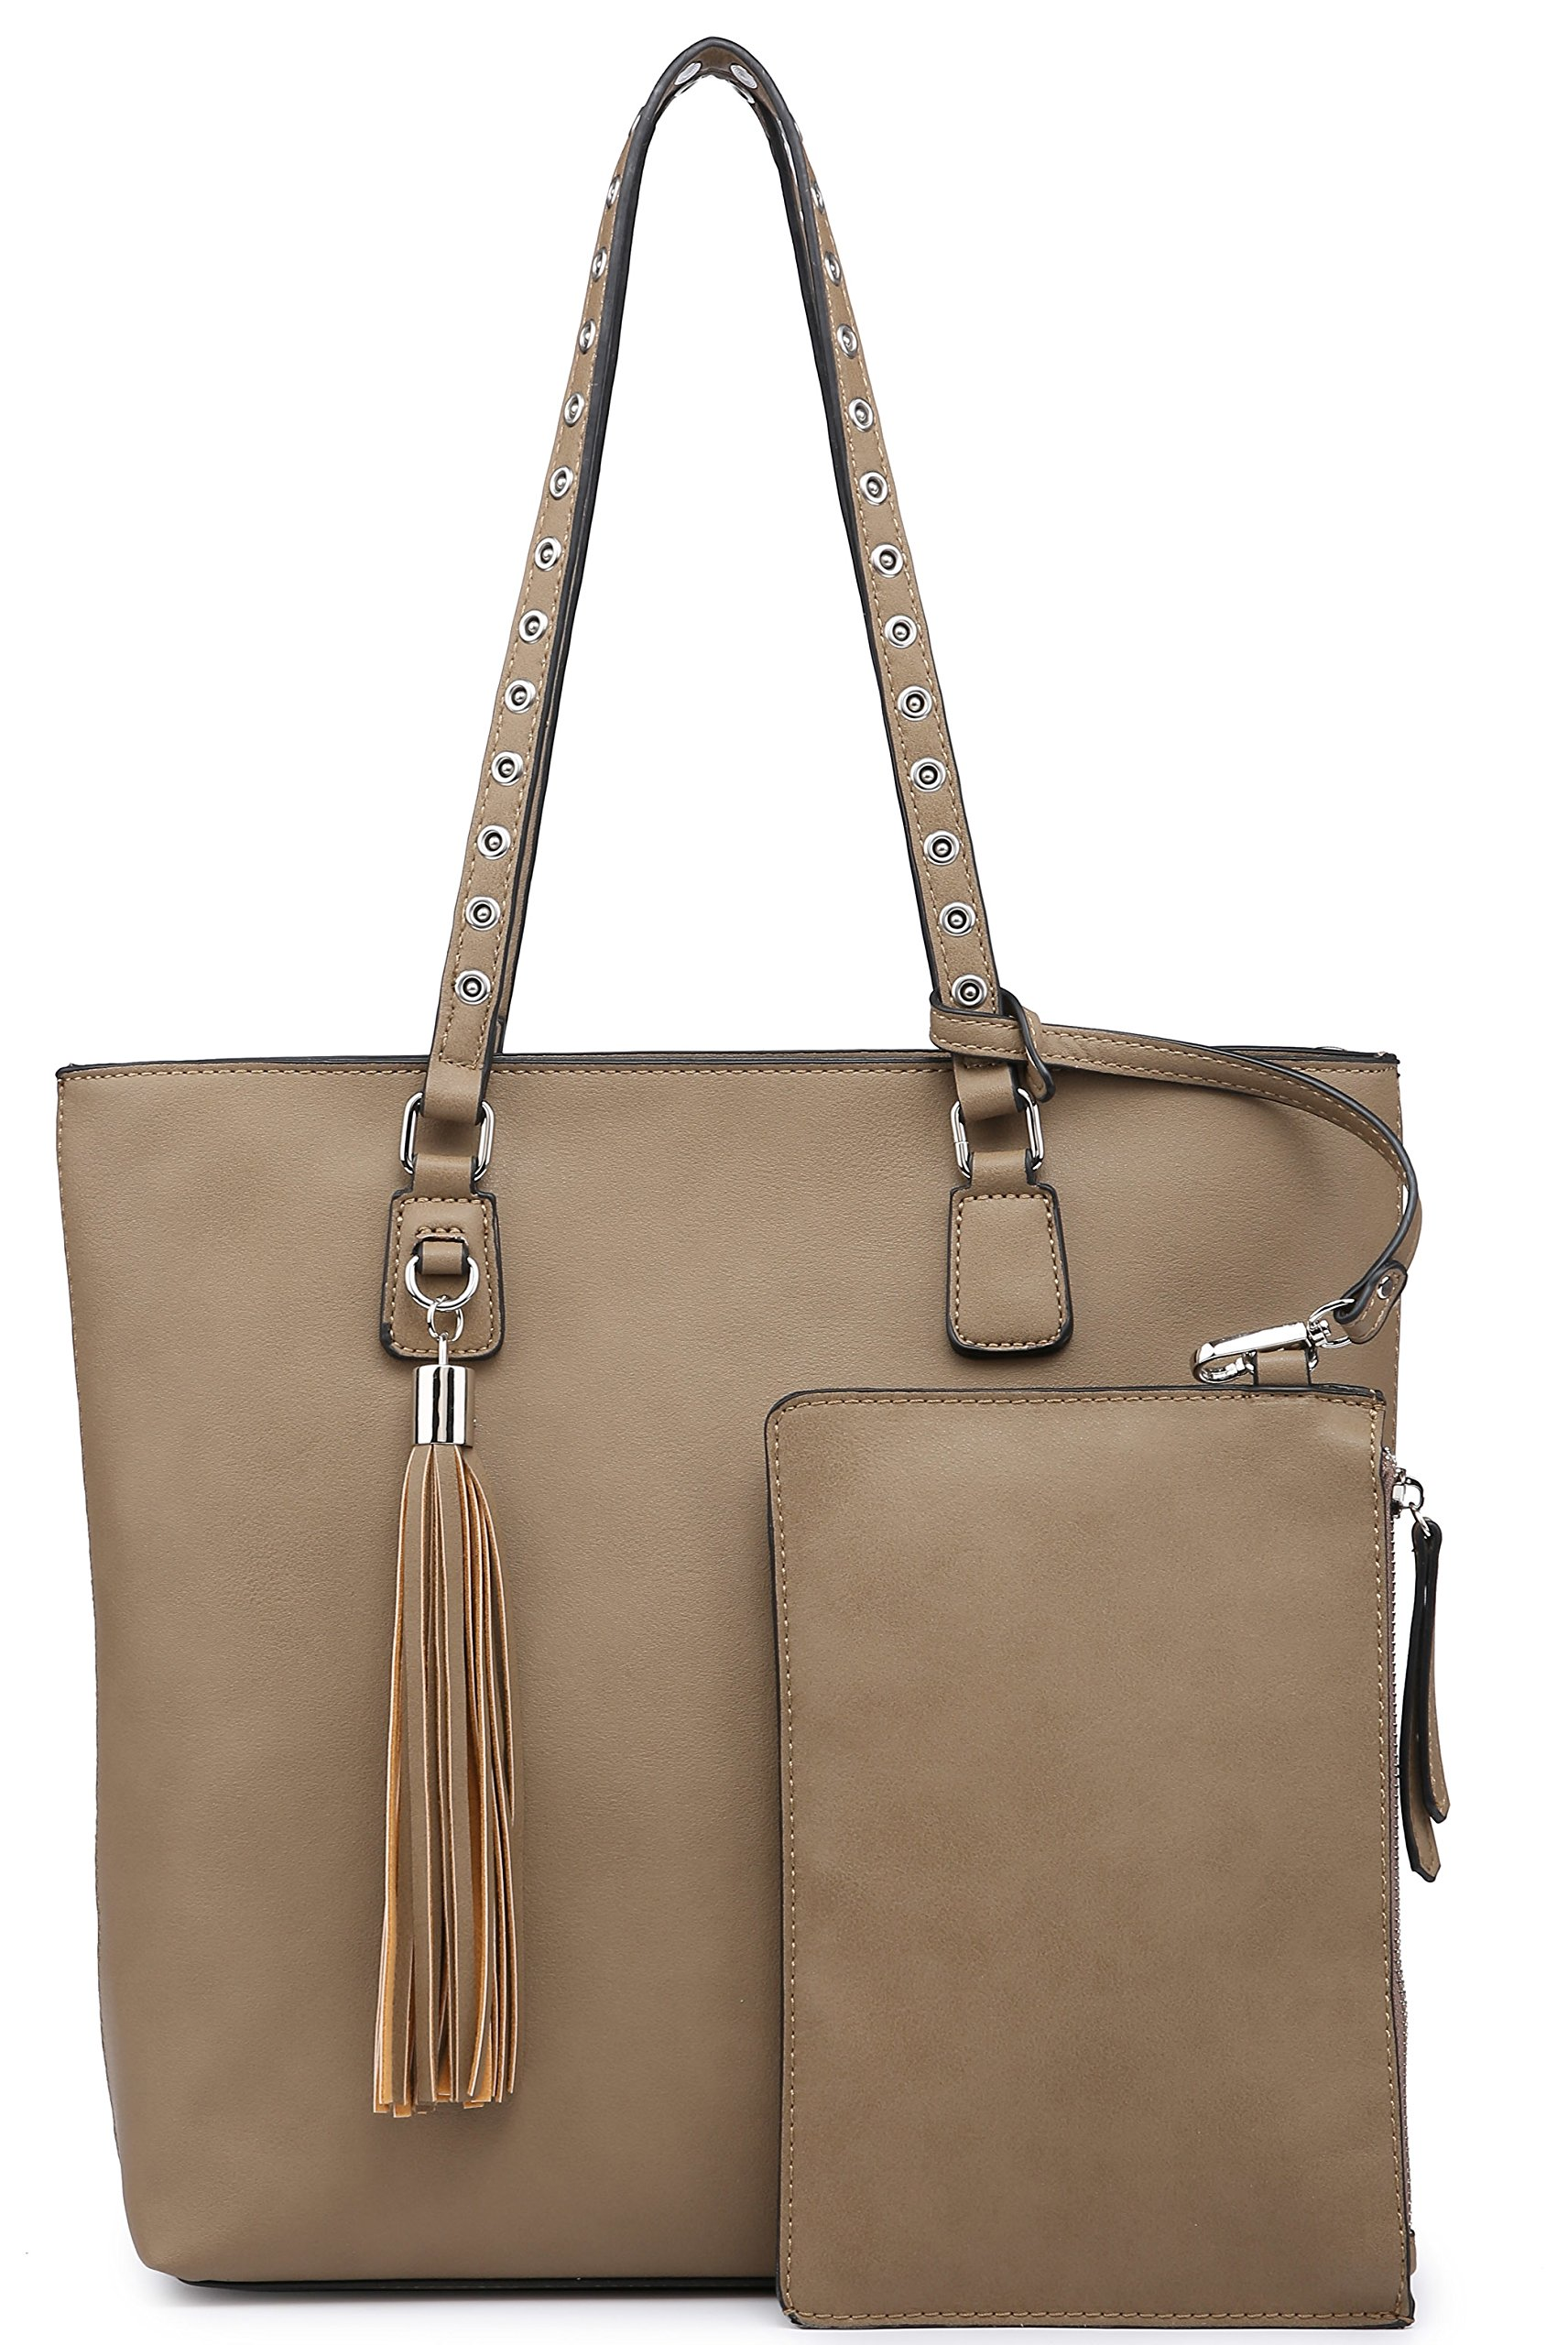 Shoulder Purse,Hobo Bag Set Tote Handbag for Women Large Chic Classic Elegant Medium Size with Wallets Tassels (Medium, Taupe)